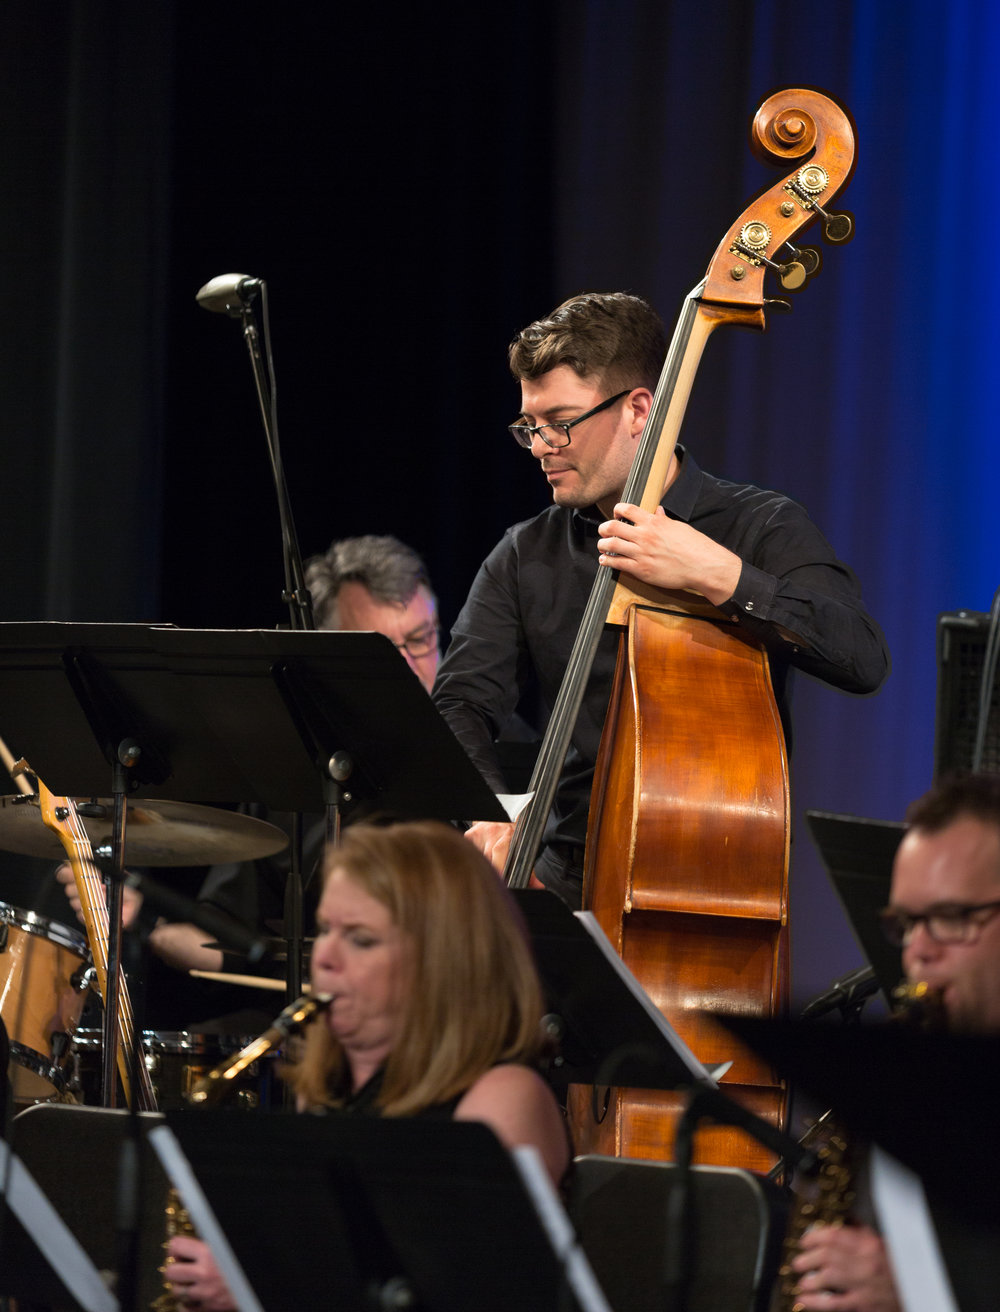 Emilio Terranova, bass